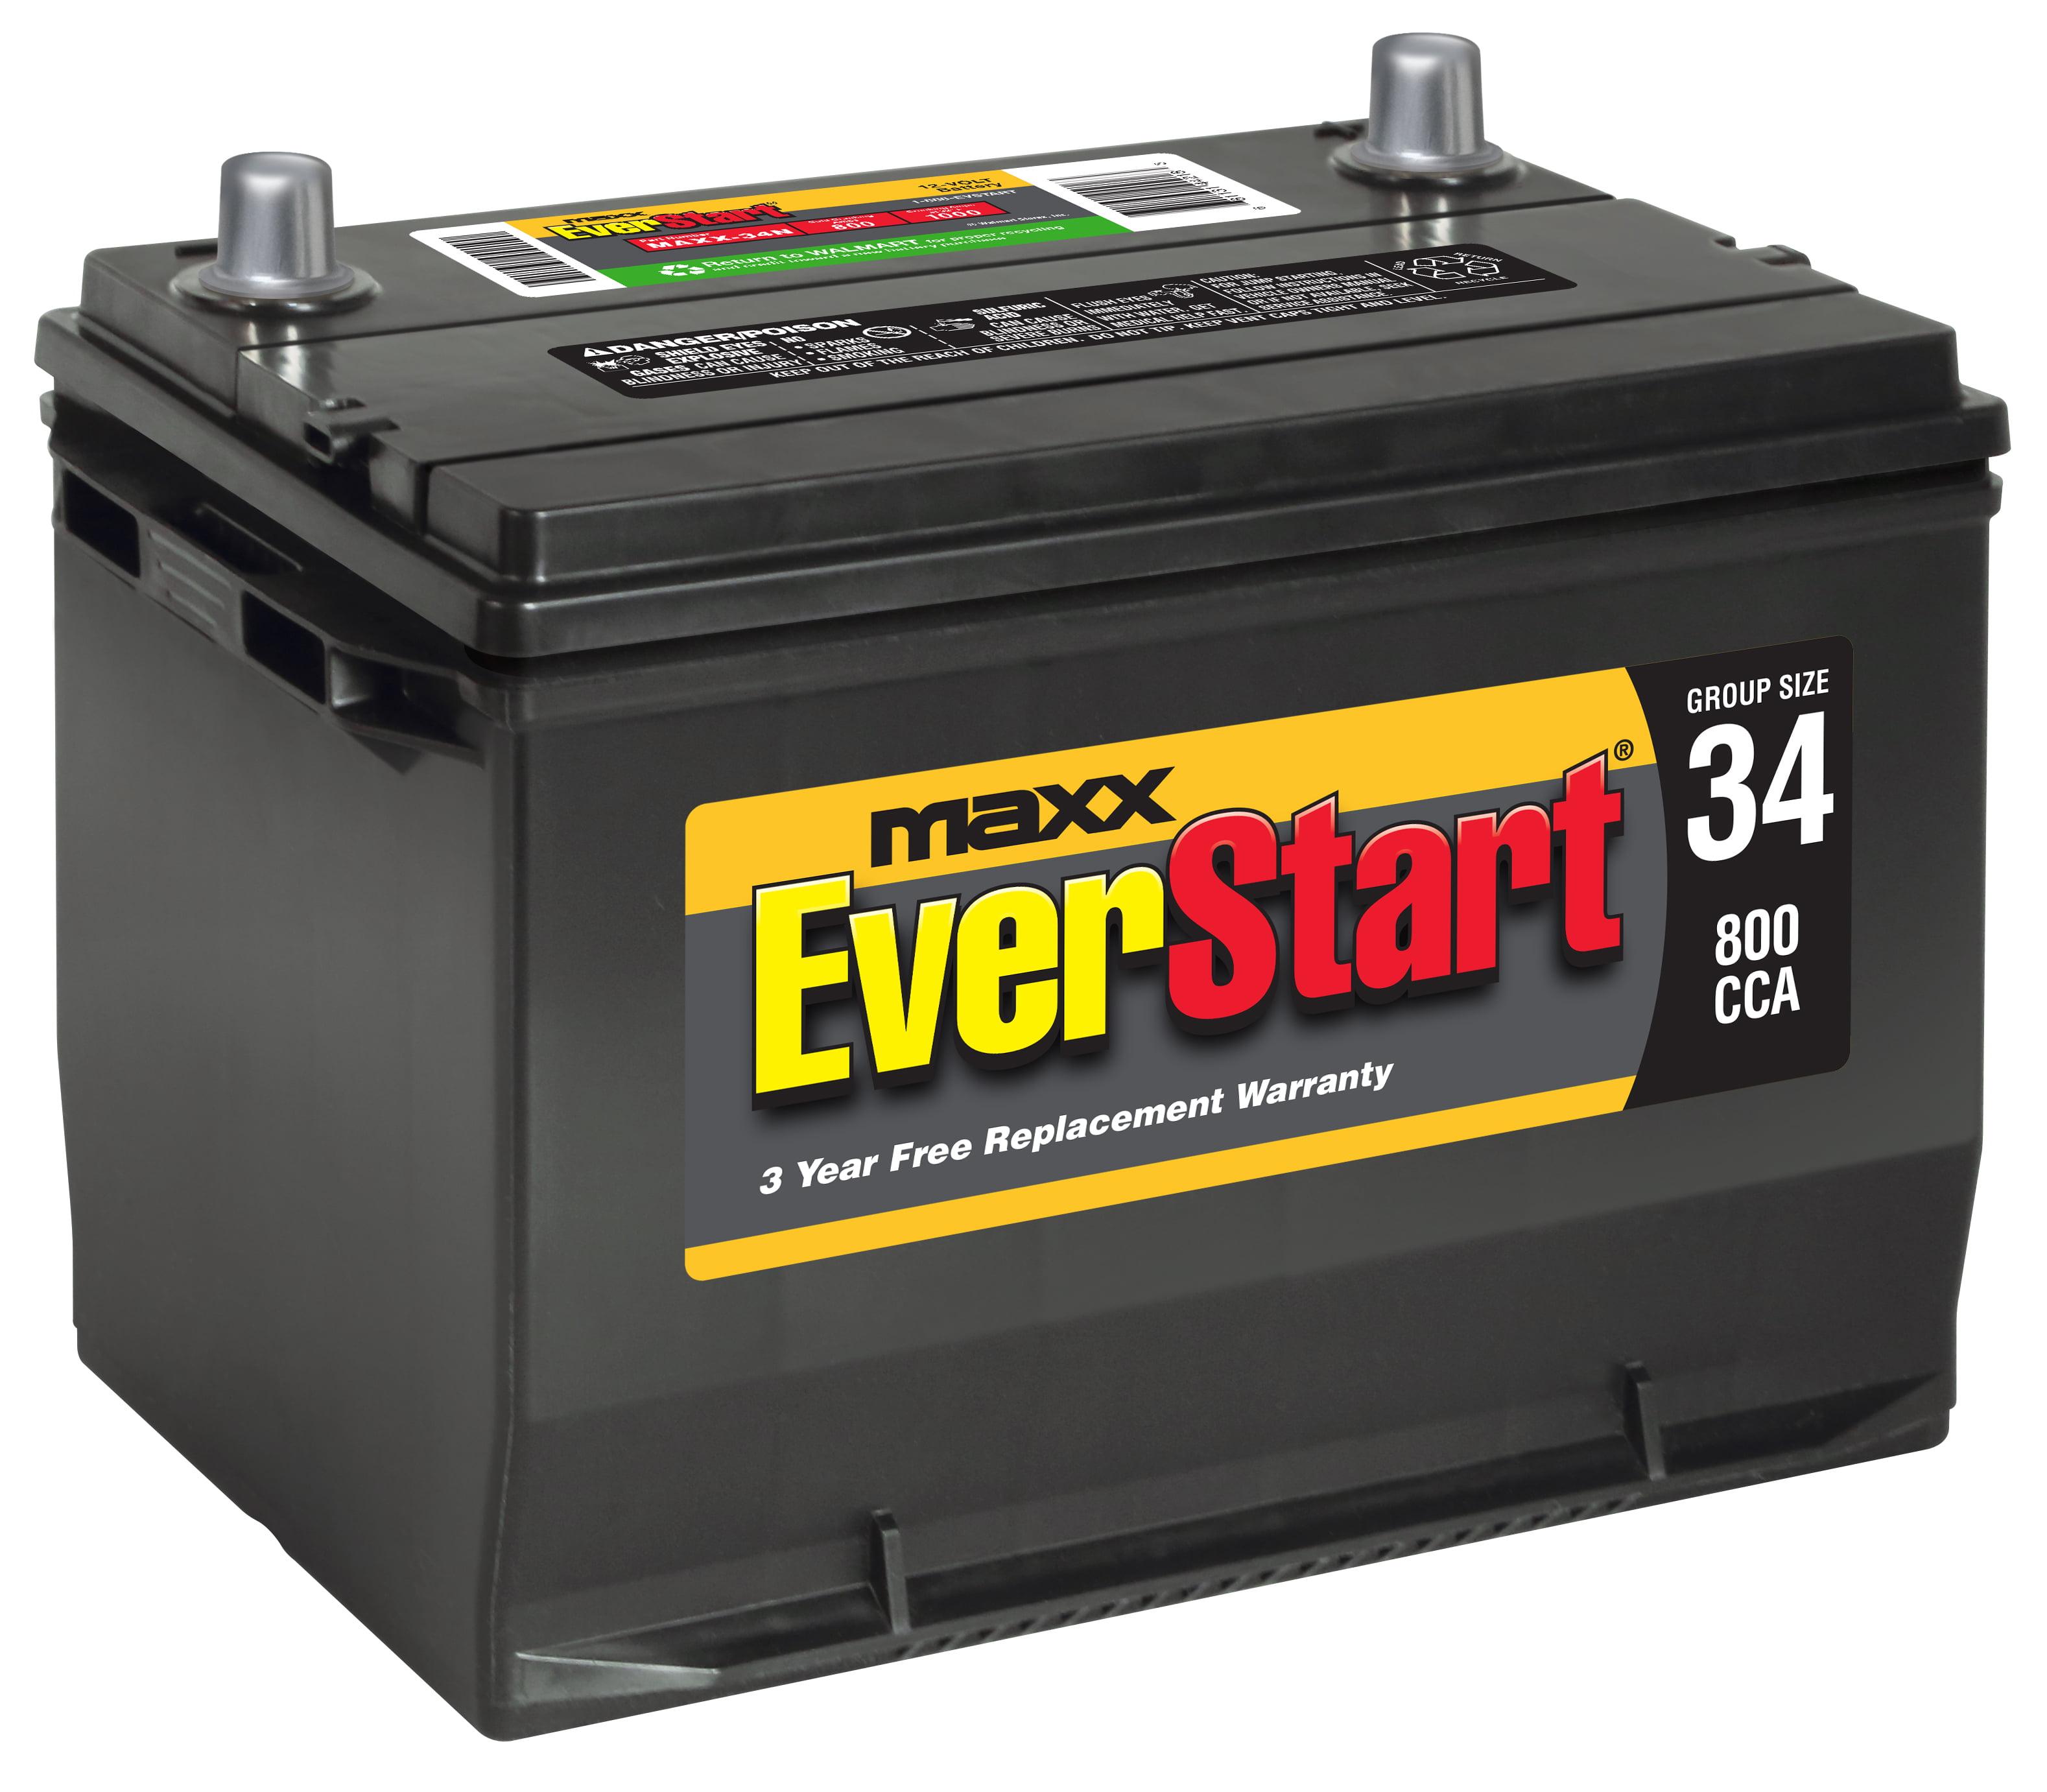 Everstart Maxx Lead Acid Automotive Battery Group Size 34n 12 Volt 800 Cca Walmart Com Walmart Com